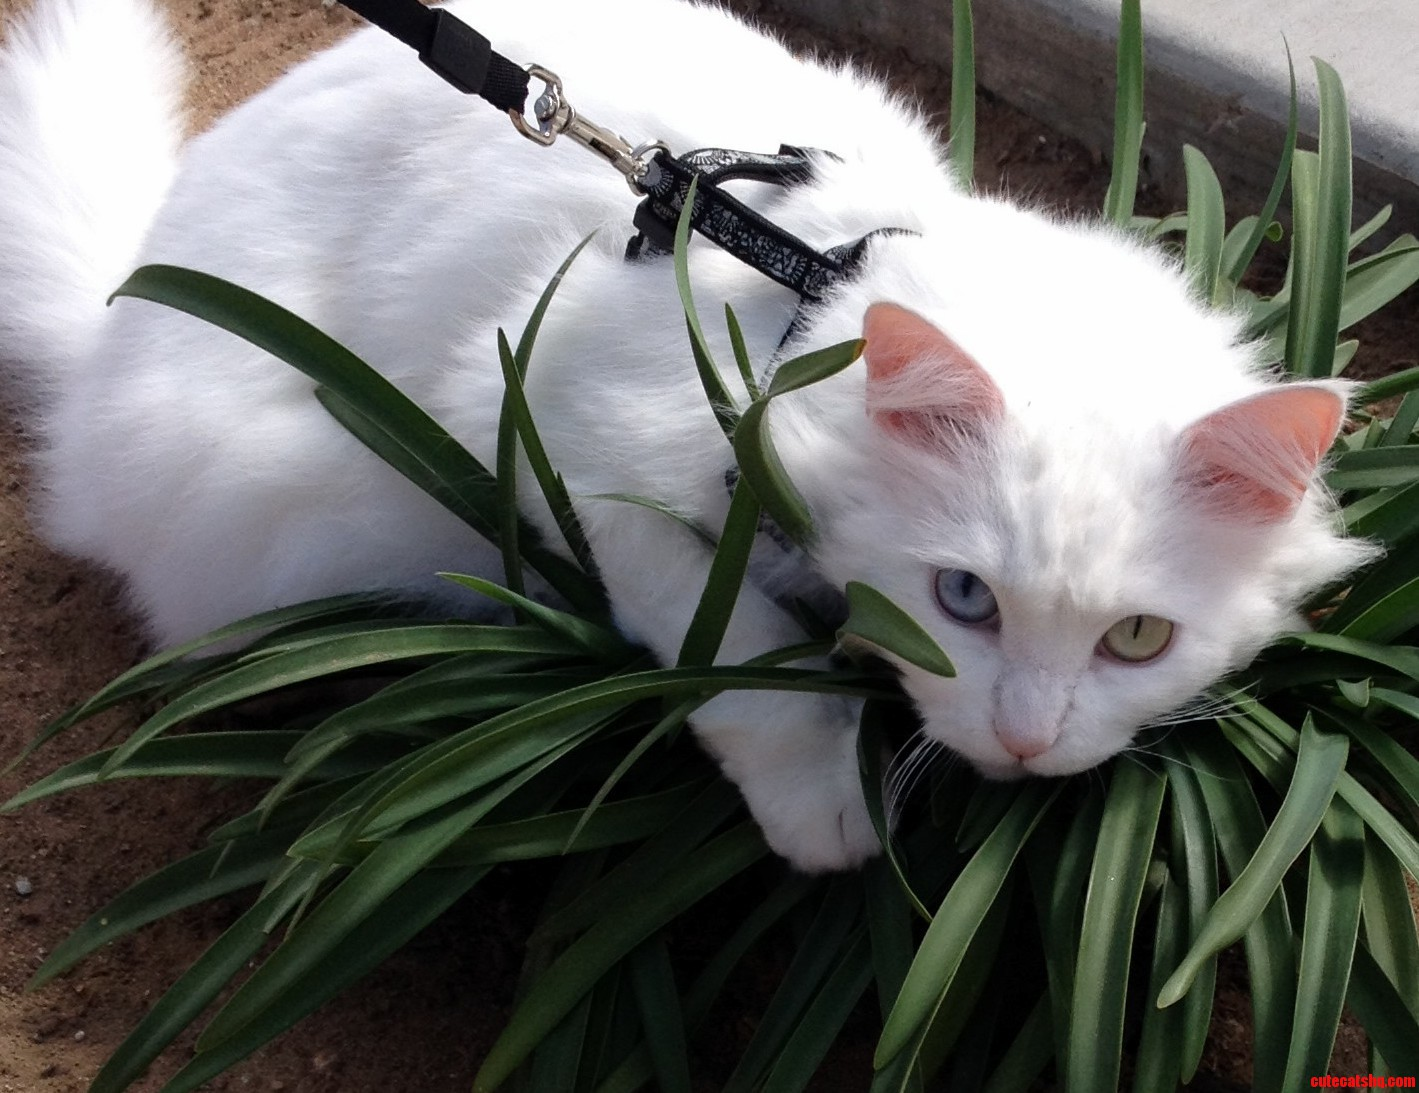 Ripley Loves Her Plants. D